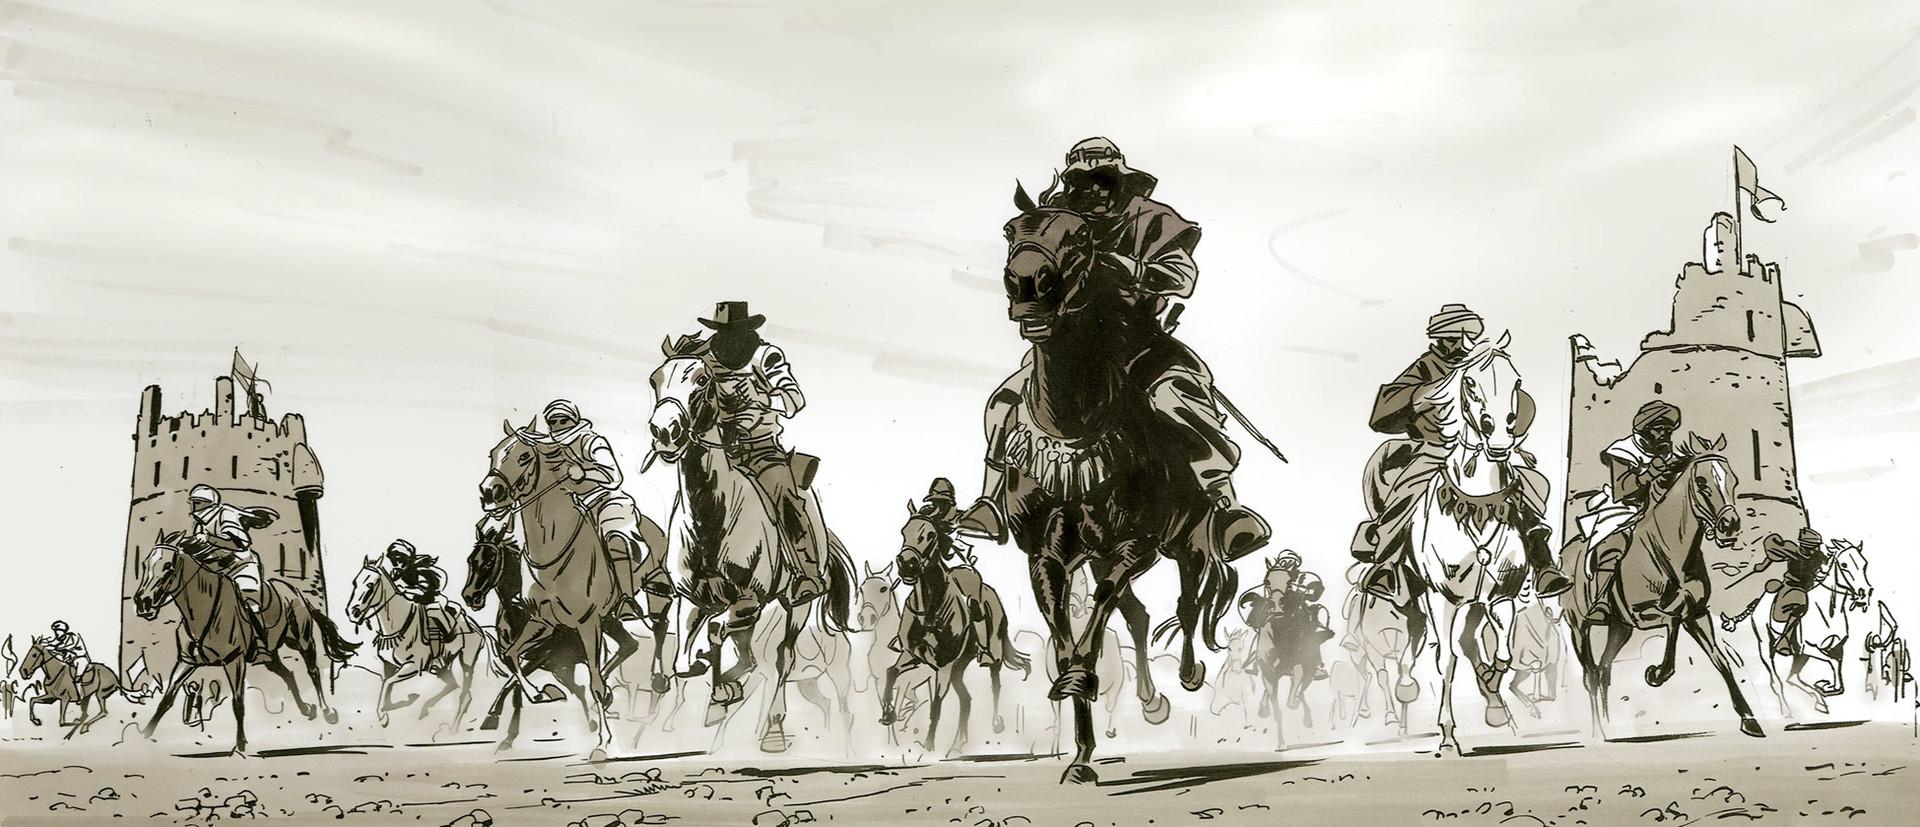 Rodolfo damaggio race